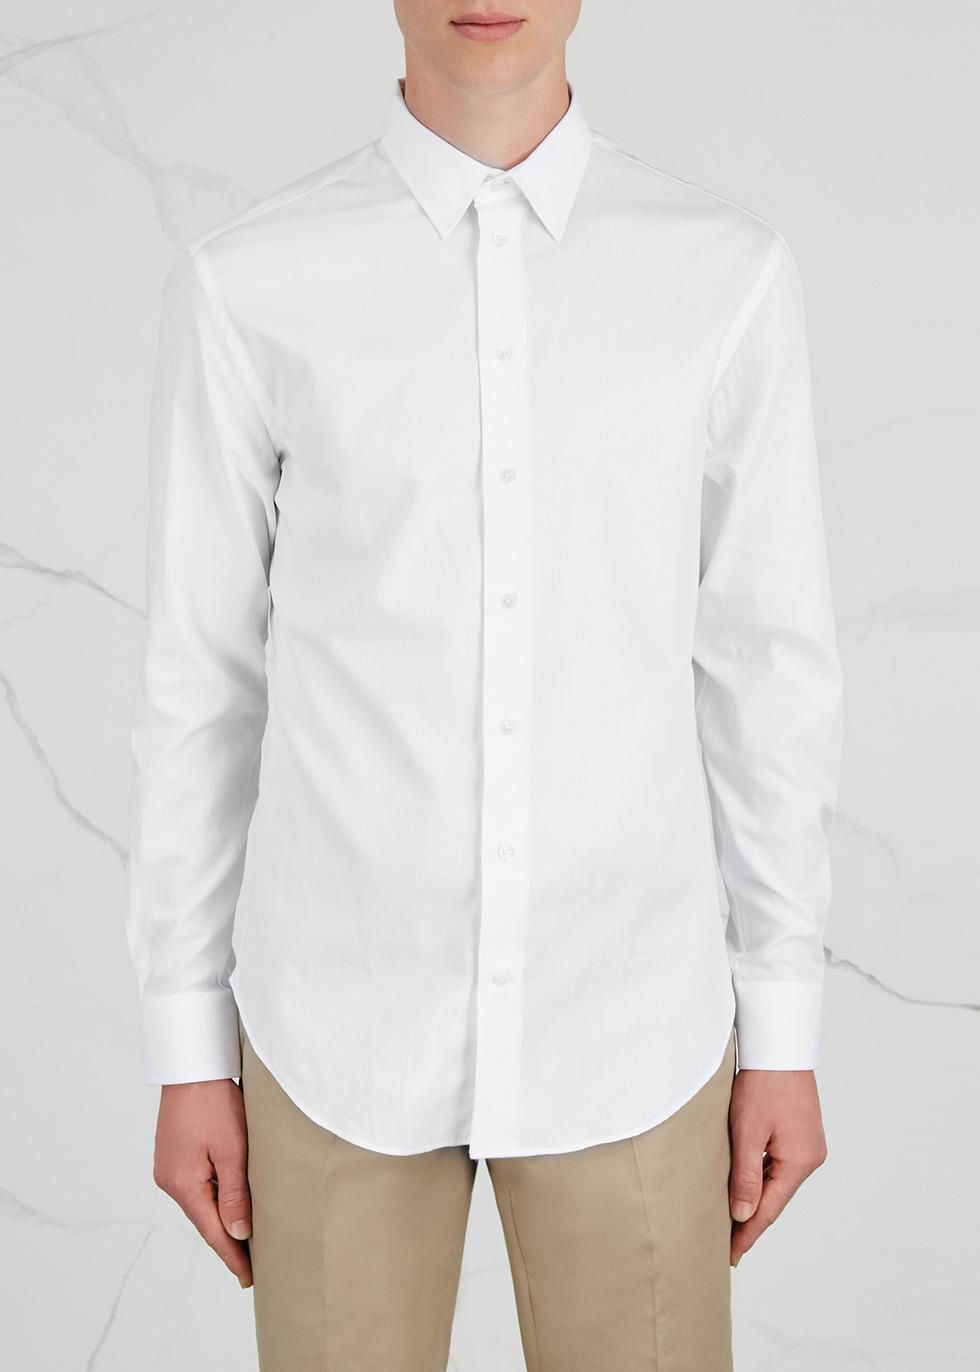 White cotton shirt - Emporio Armani